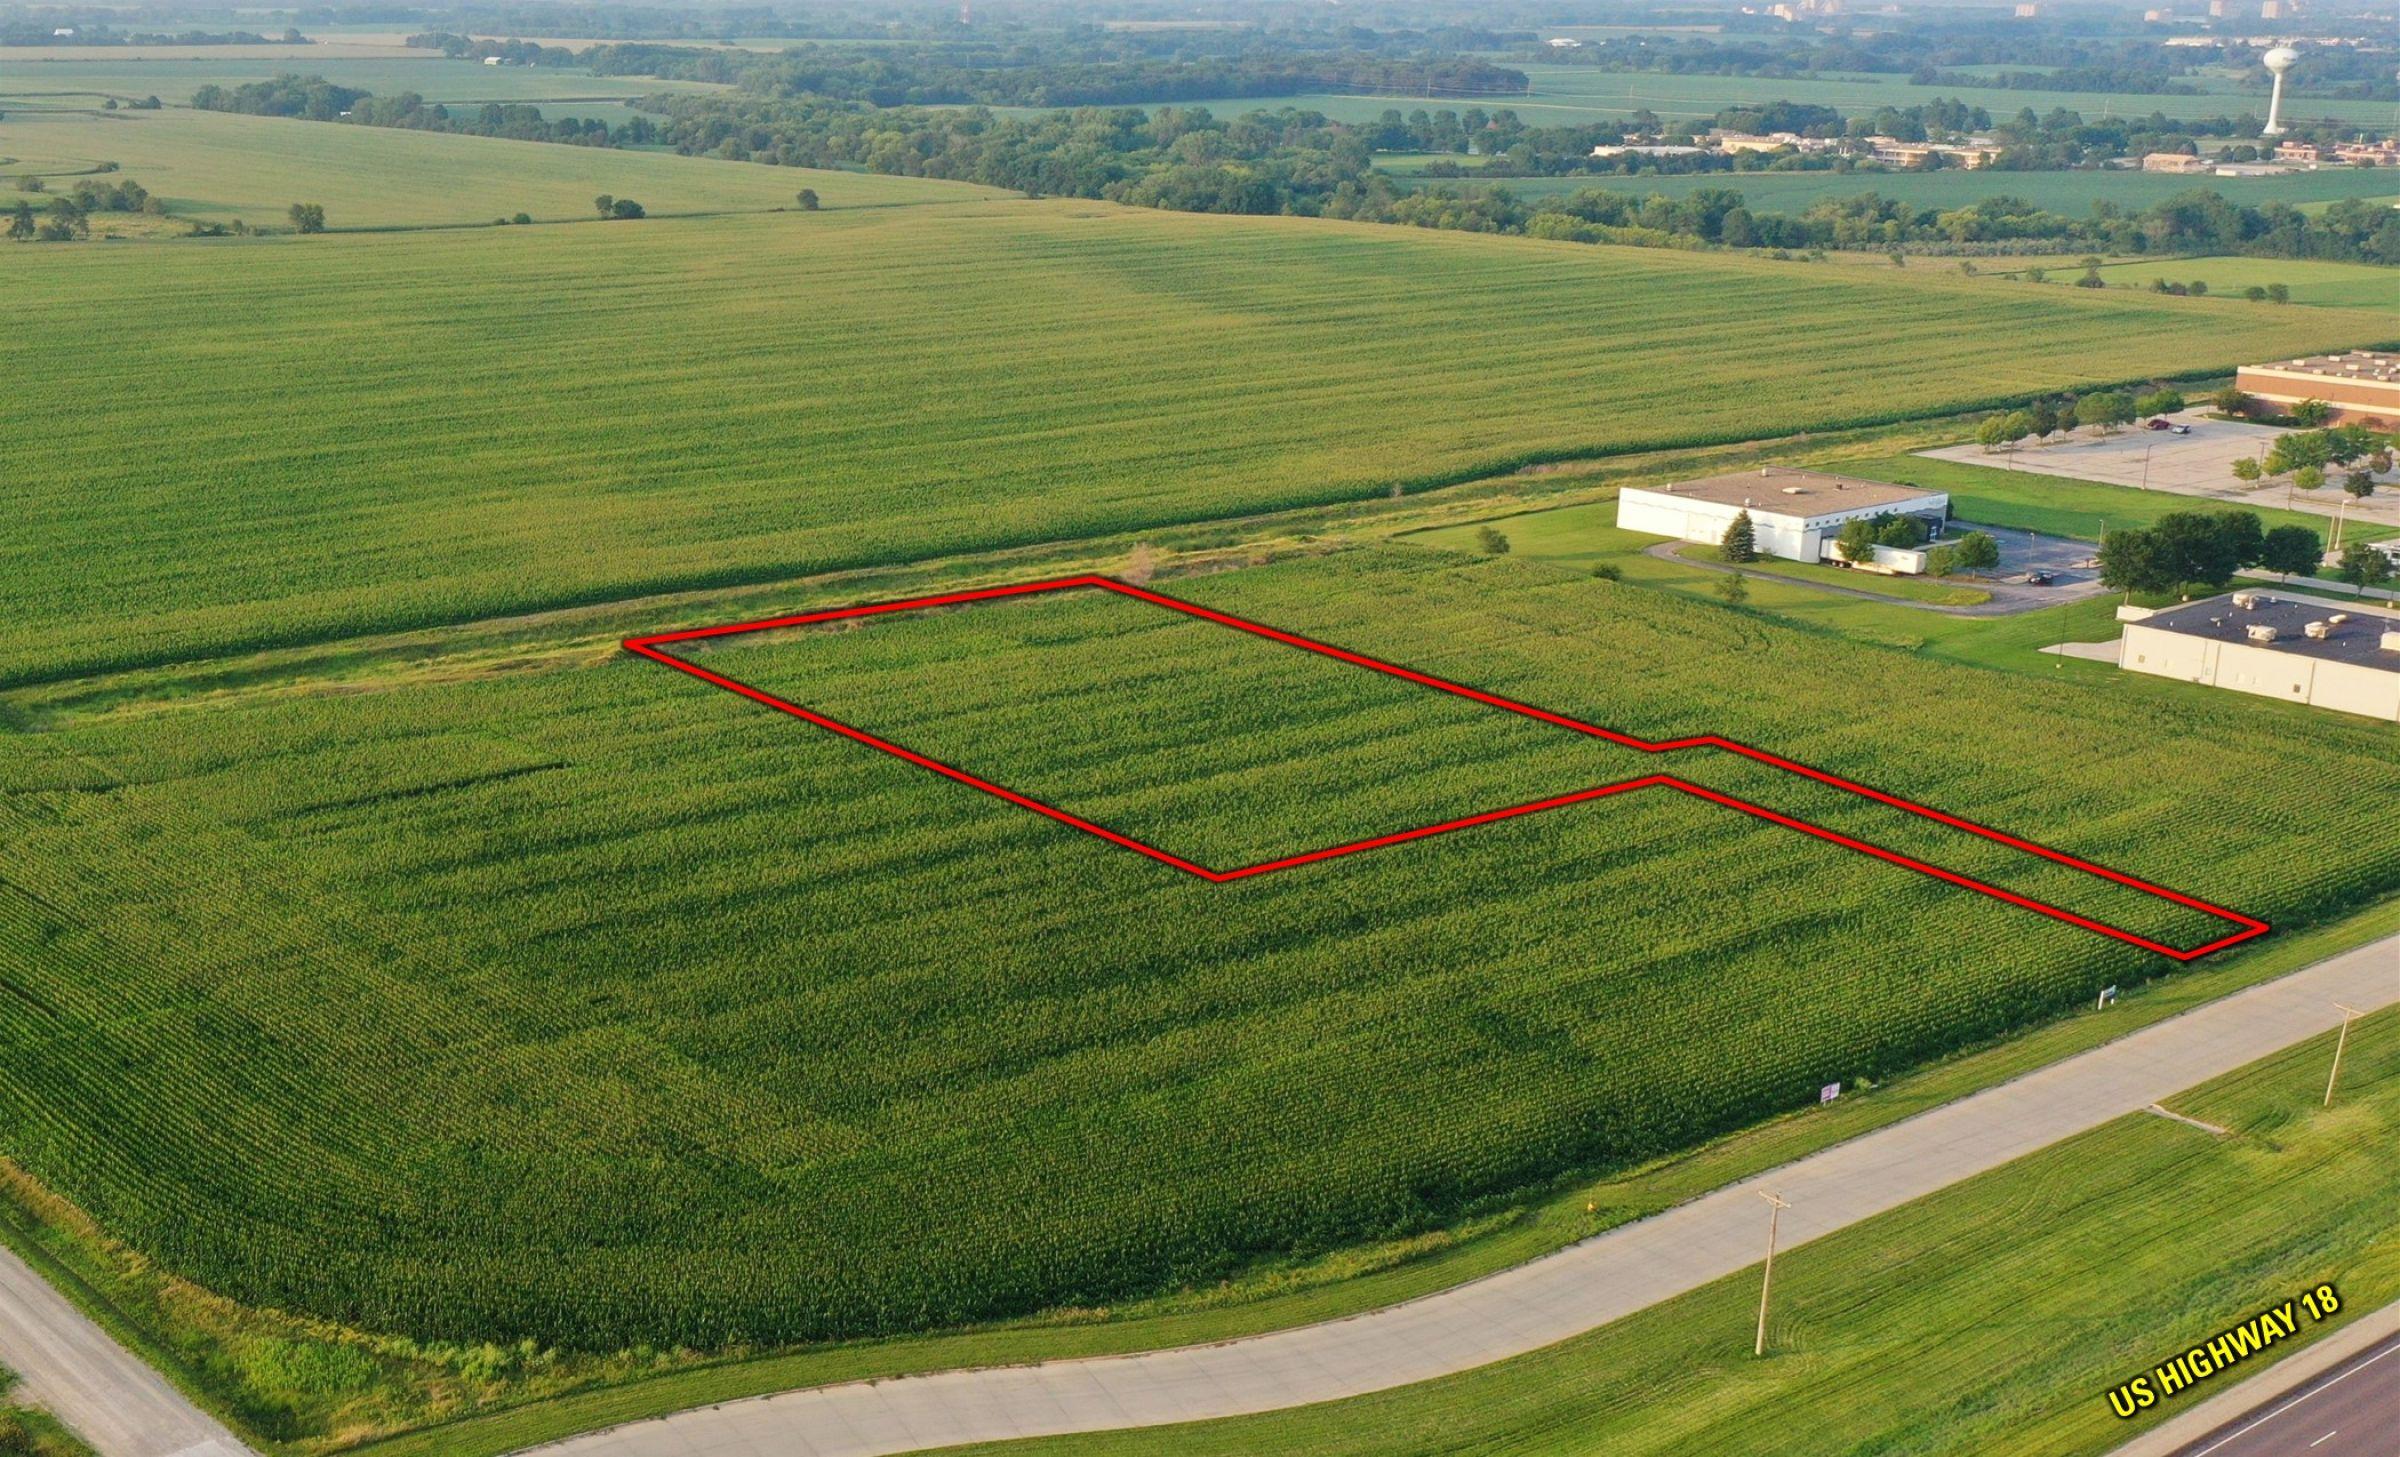 development-land-commercial-cerro-gordo-county-iowa-2-acres-listing-number-15643-3-2021-07-20-031619.jpg